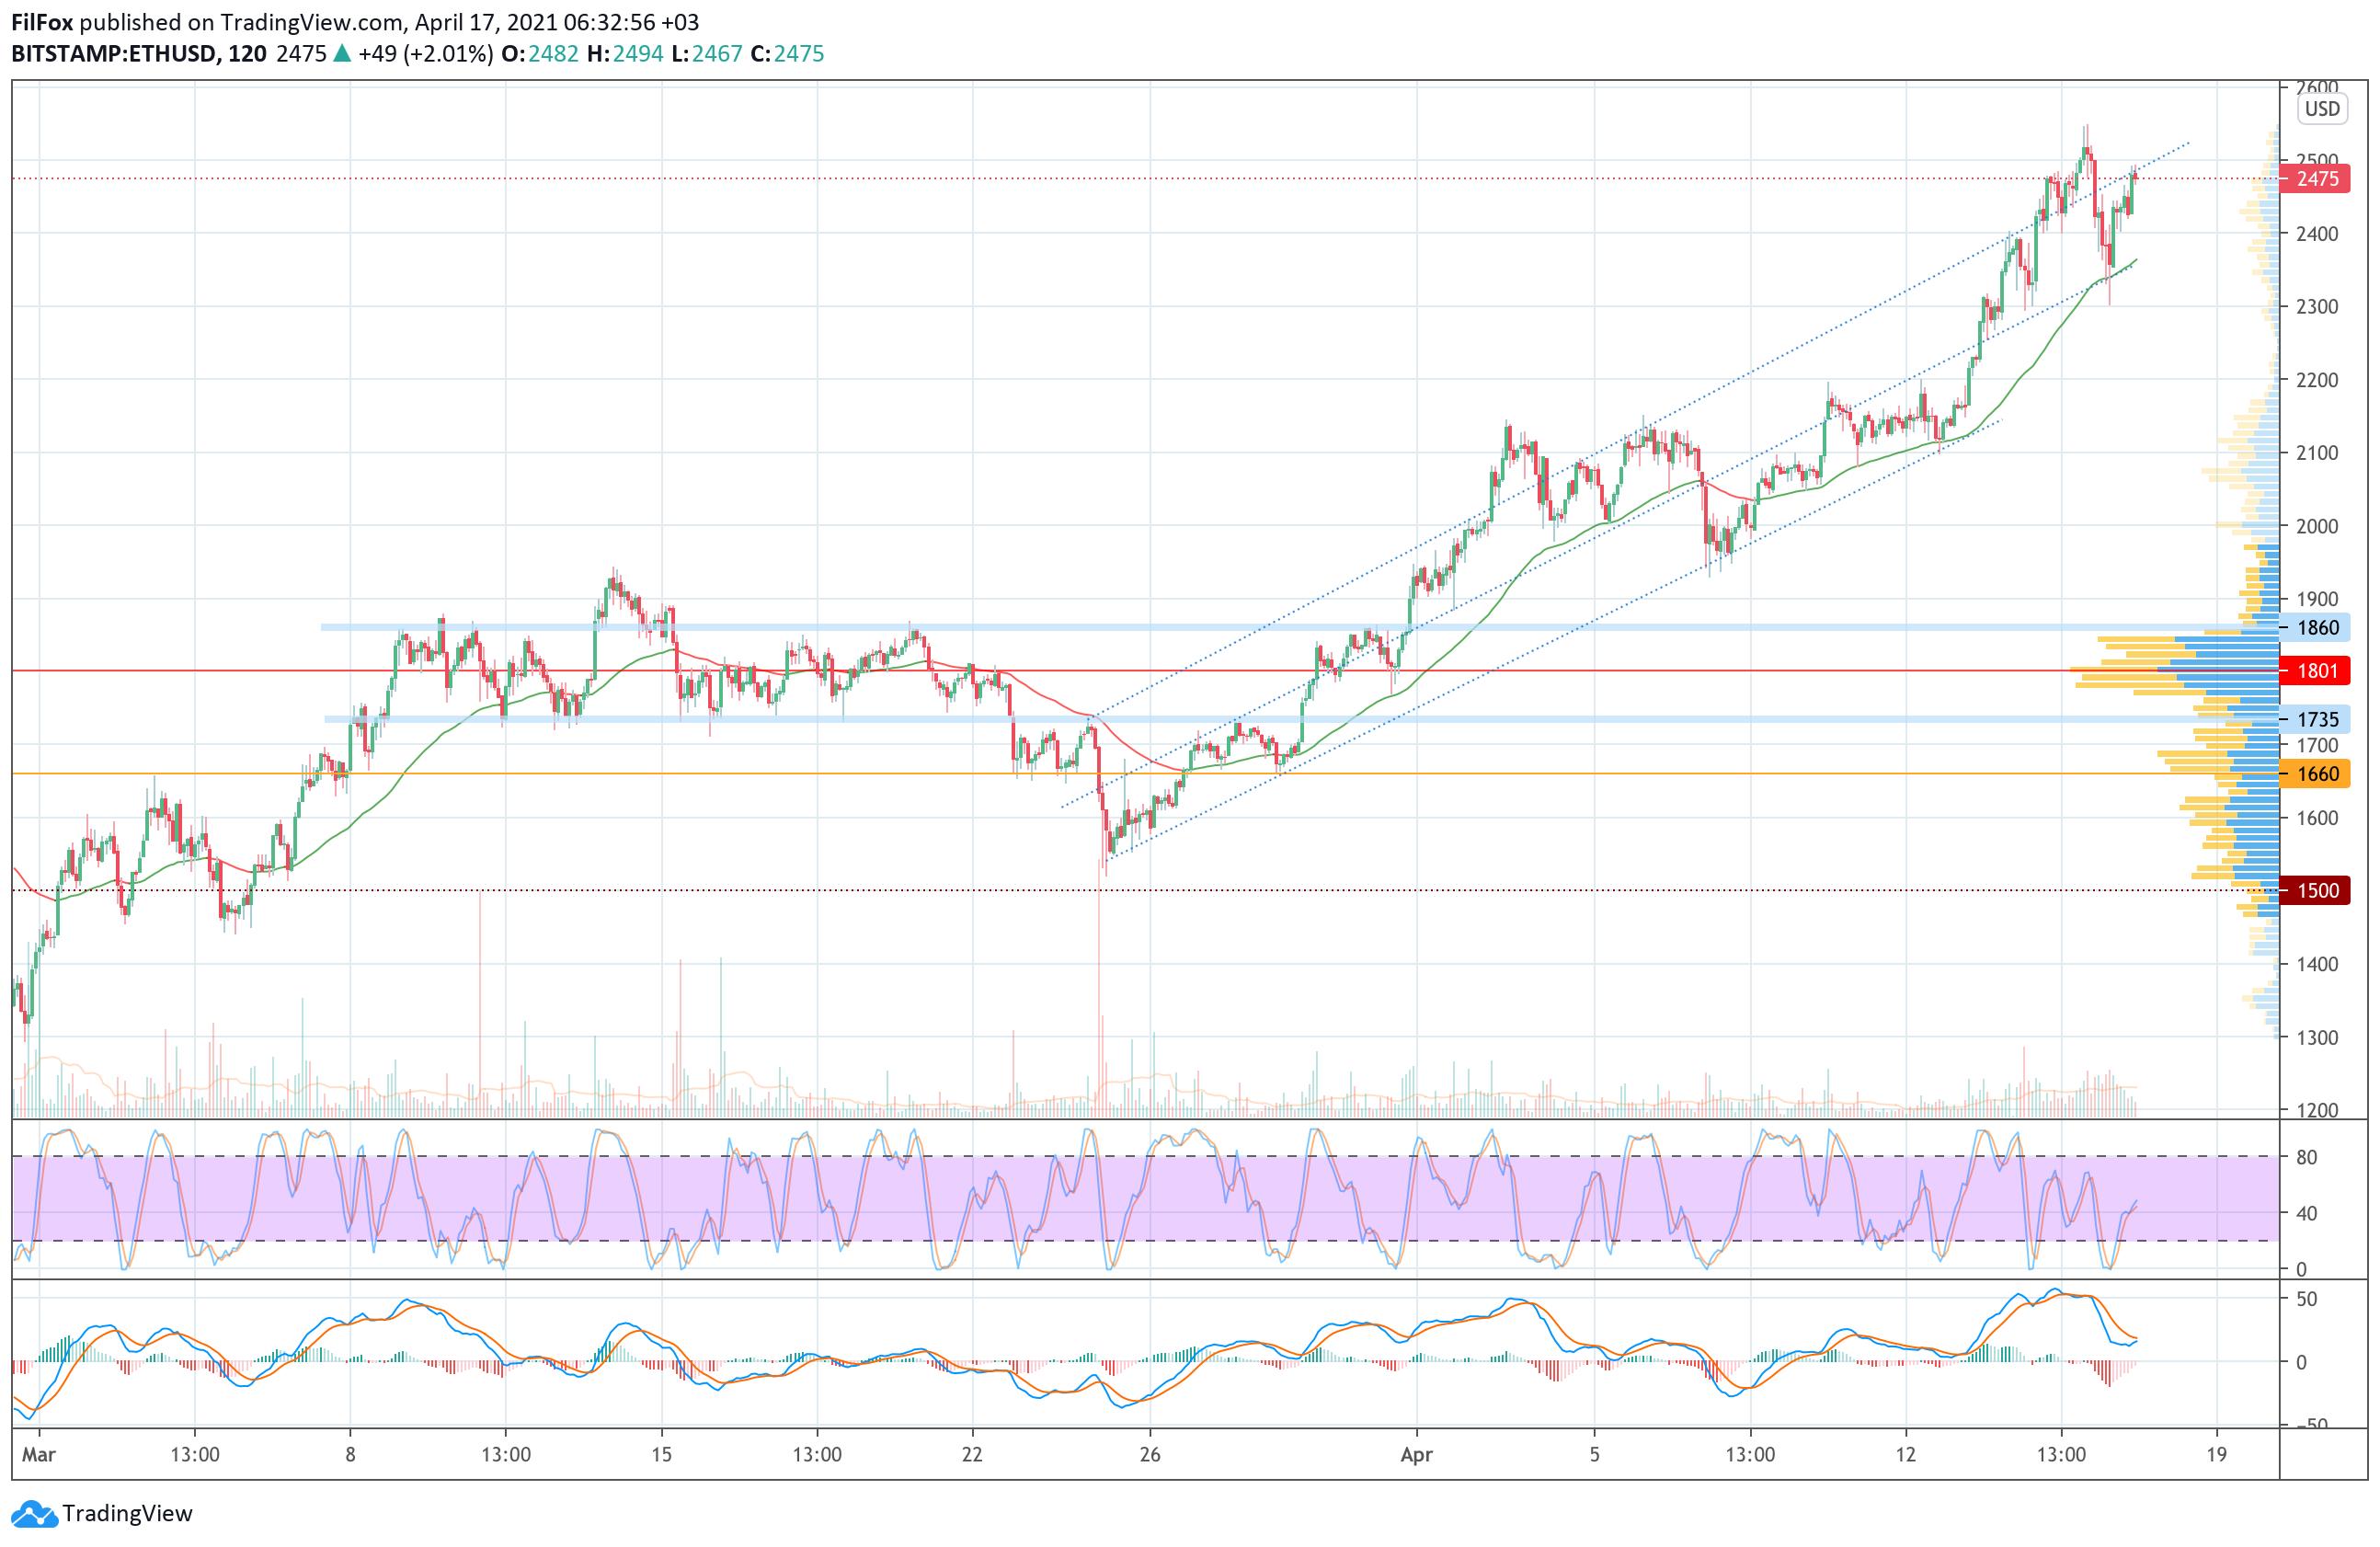 006714 - Анализ цен Bitcoin, Ethereum, XRP на 17.04.2021